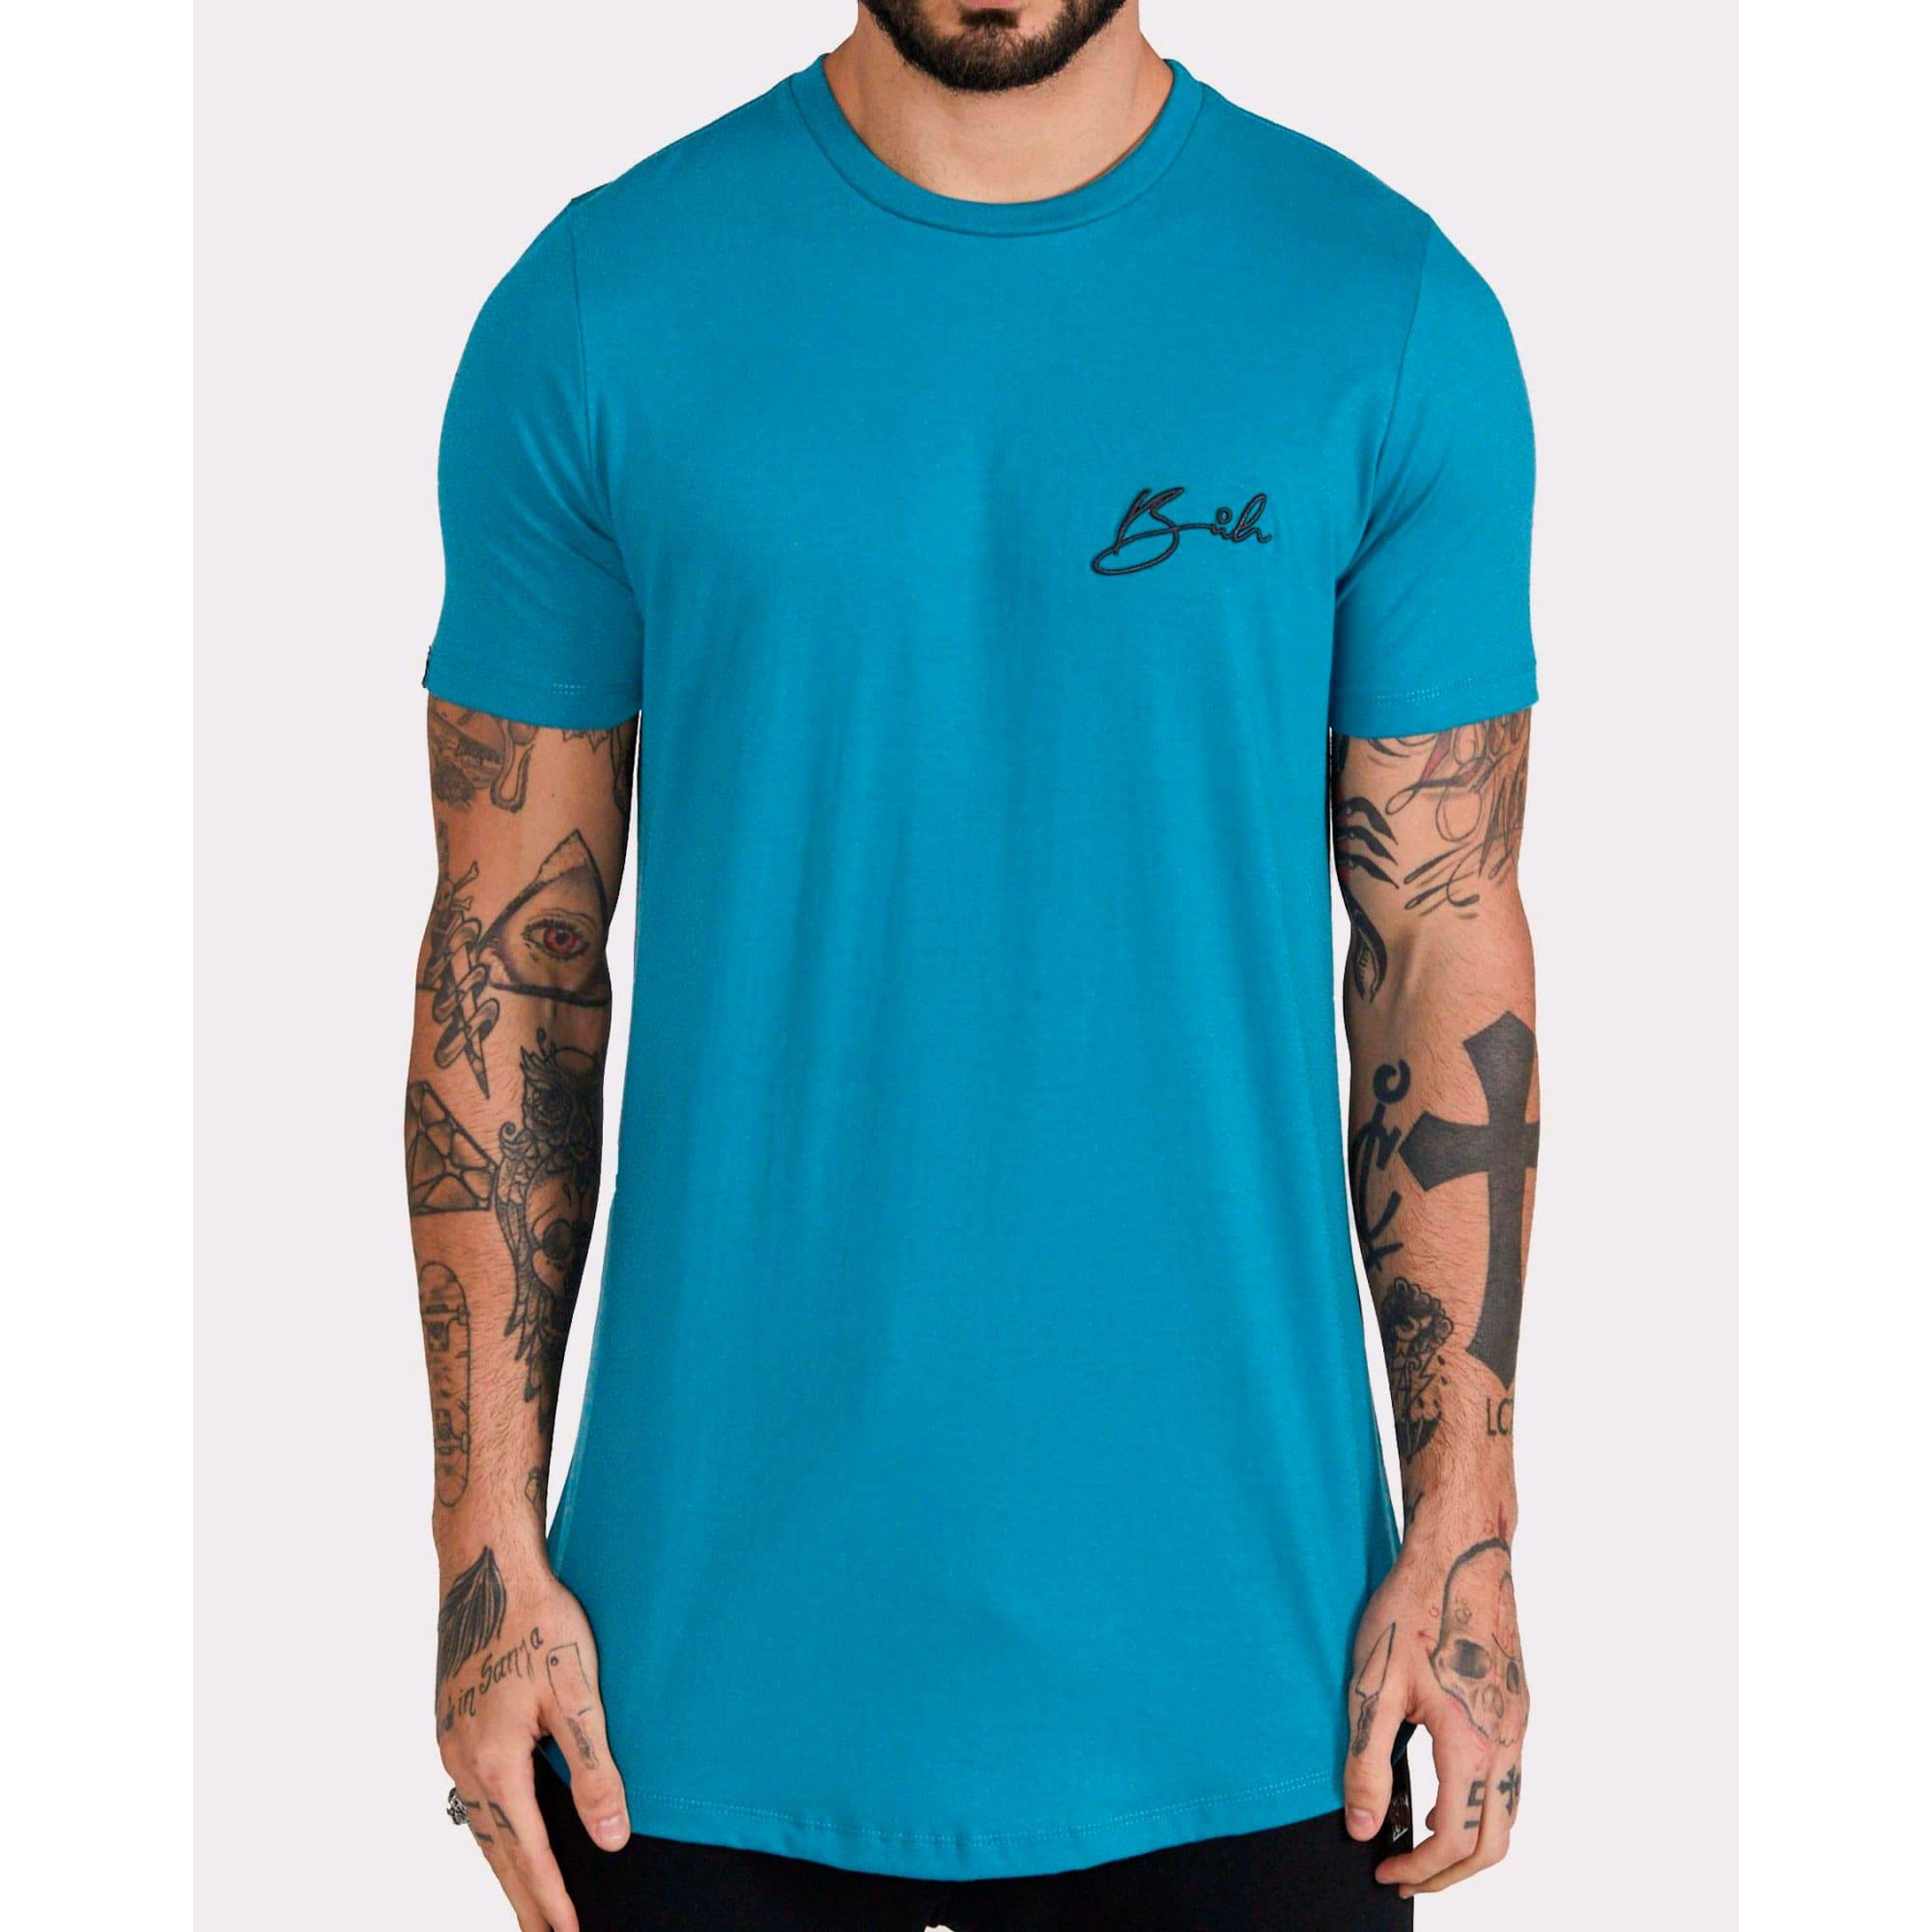 Camiseta Buh Bordado Blue